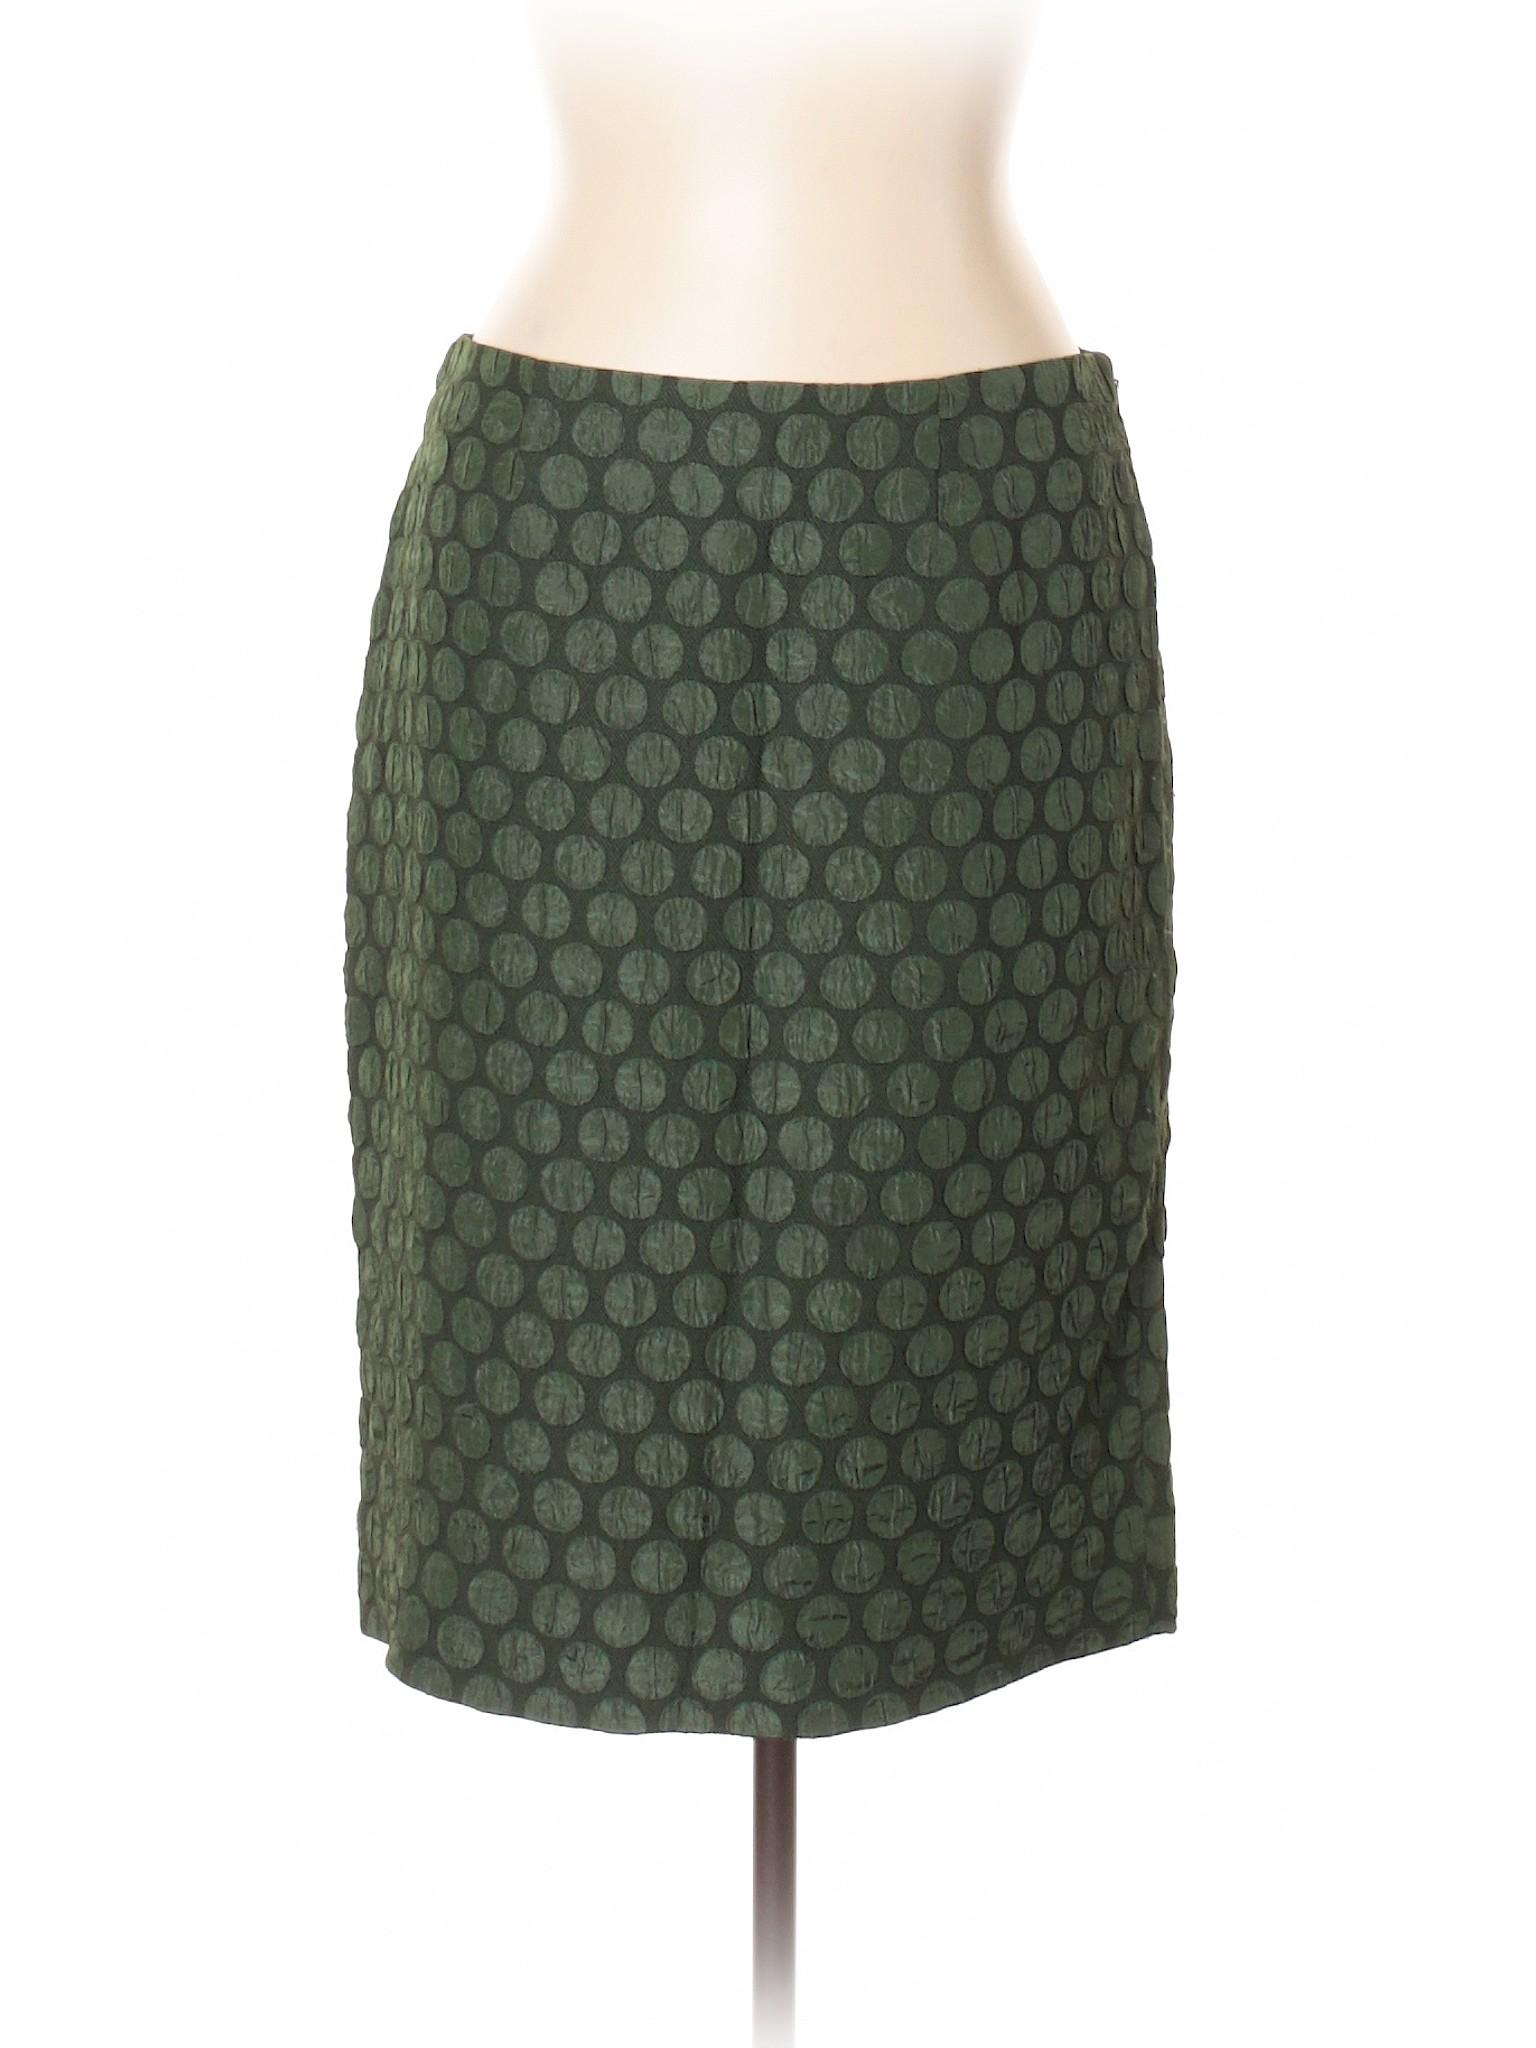 Casual Skirt Casual Boutique Boutique Skirt Boutique aq61qTF